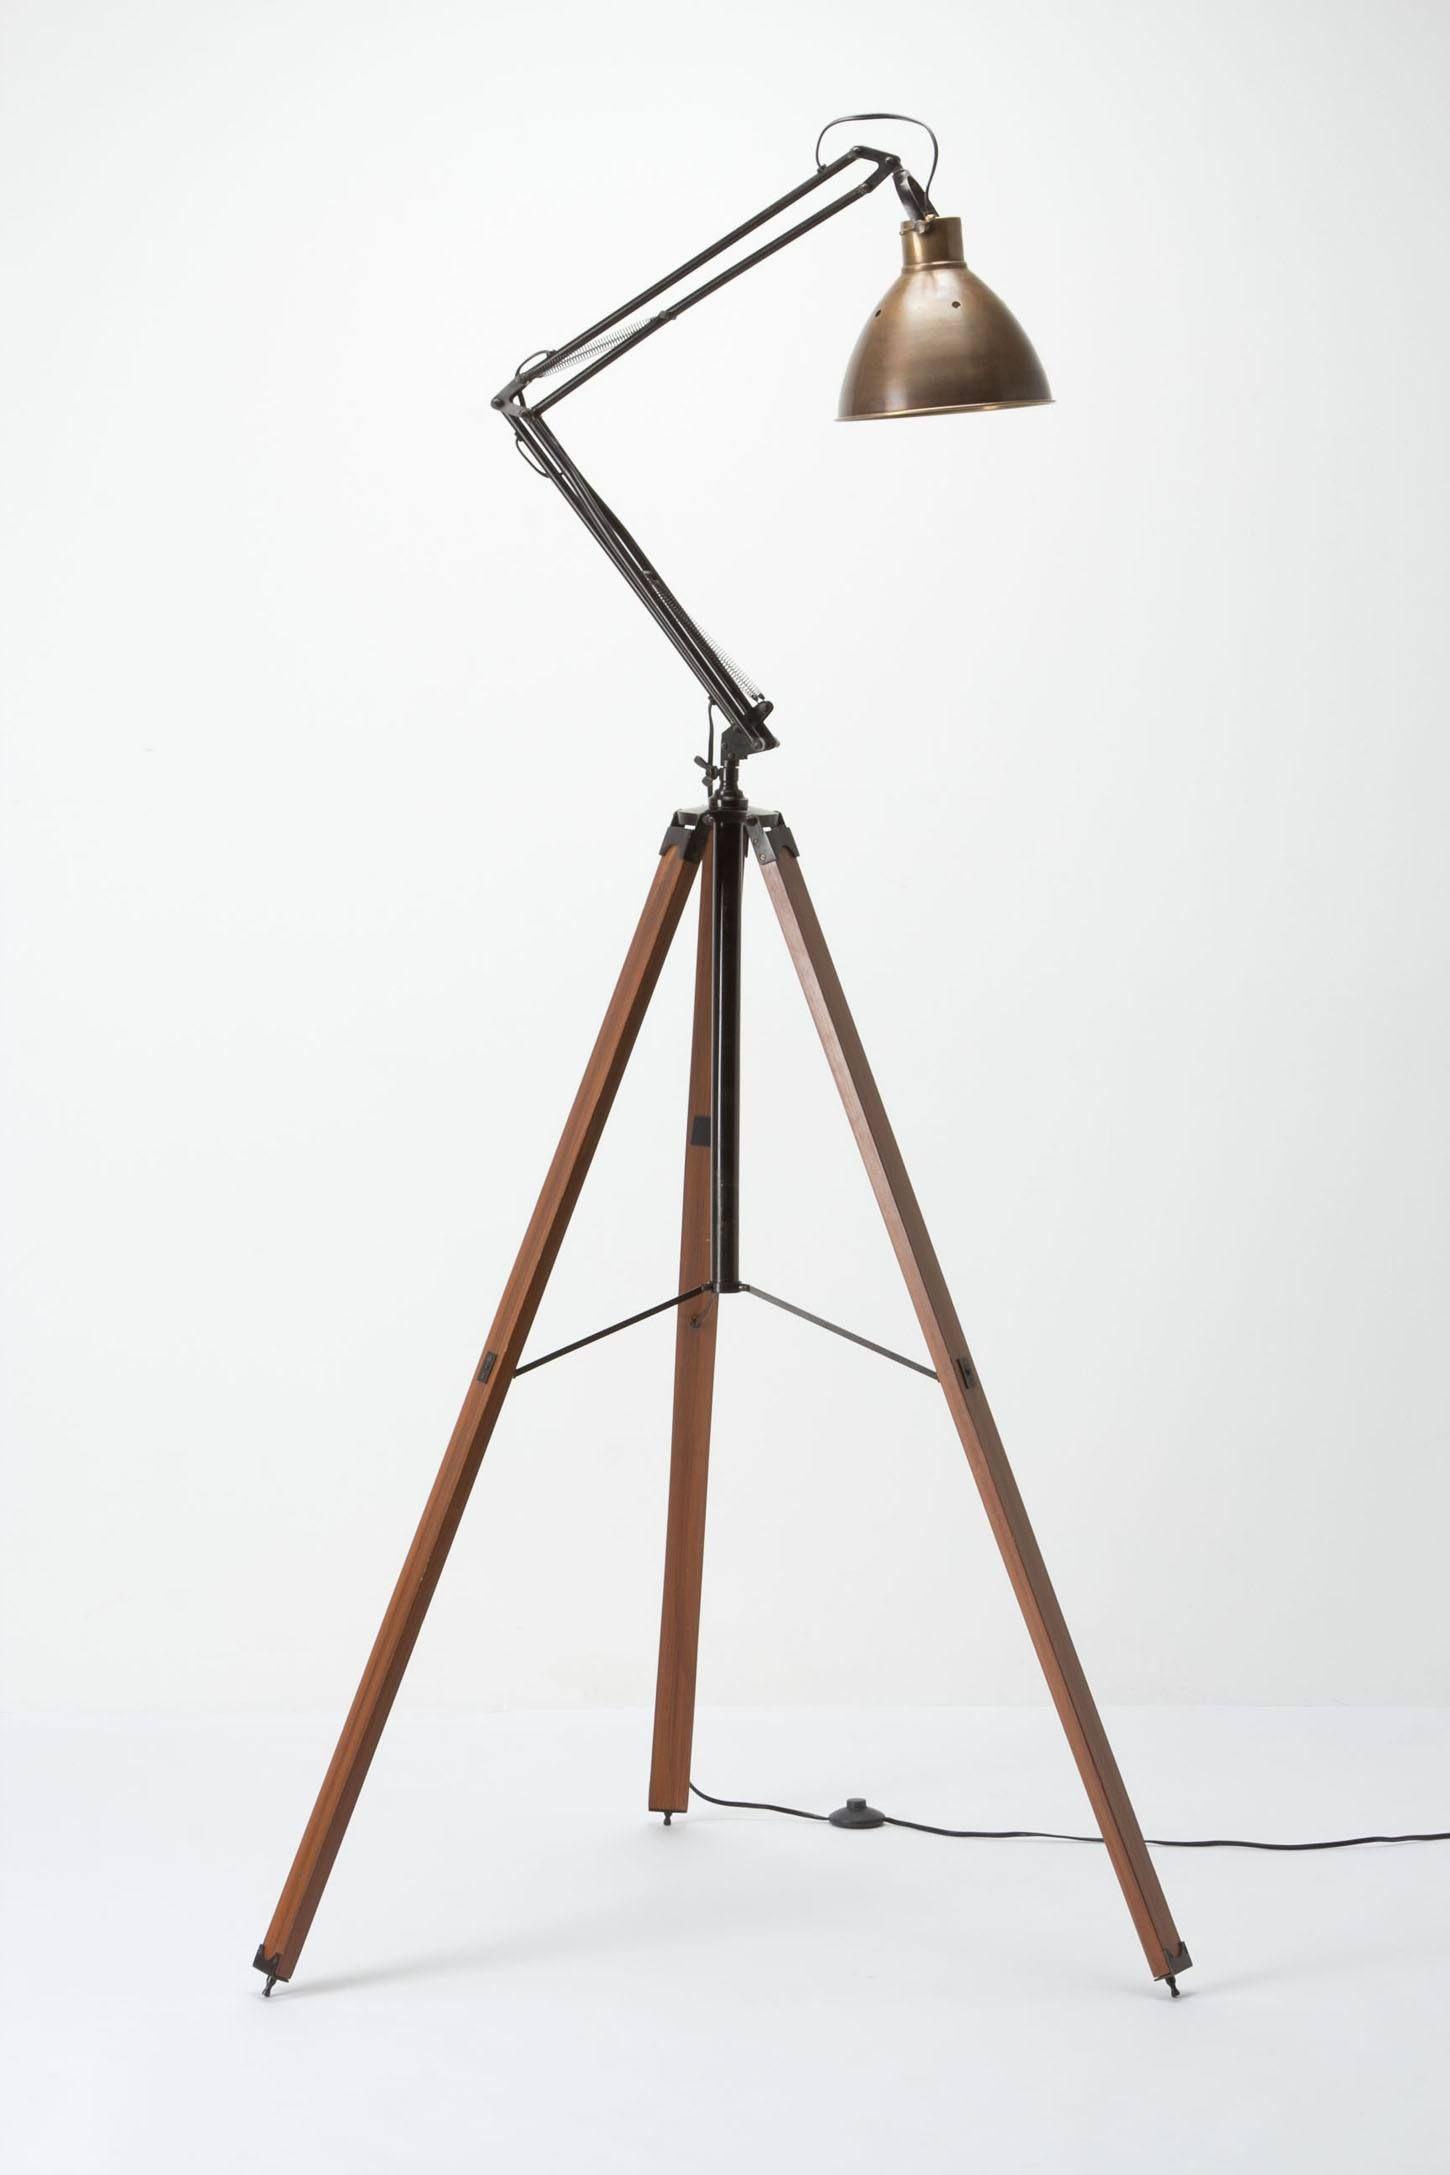 Architect Tripod Lamp Tripod lamp, Modern floor lamps